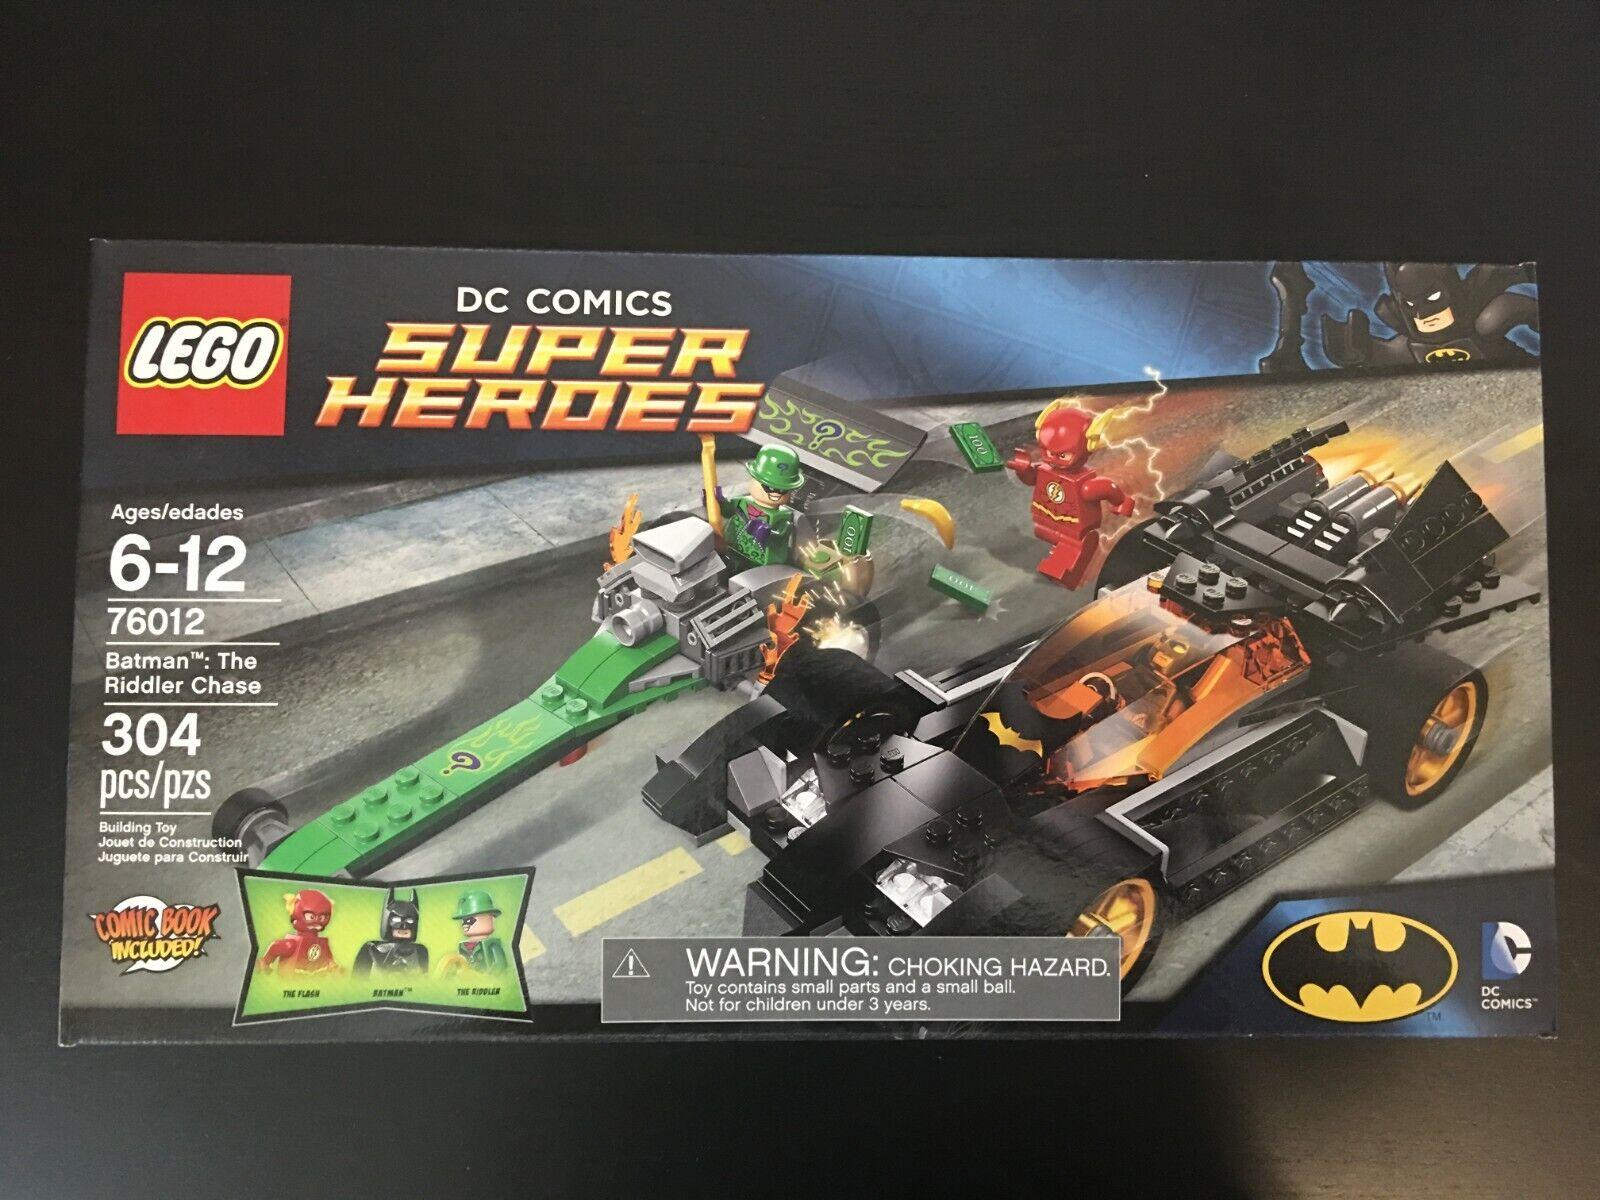 nuovo Lego  76012 DC Comics Super Heroes Batuomo The Riddler Chase Batmobile Flash  wholesape economico